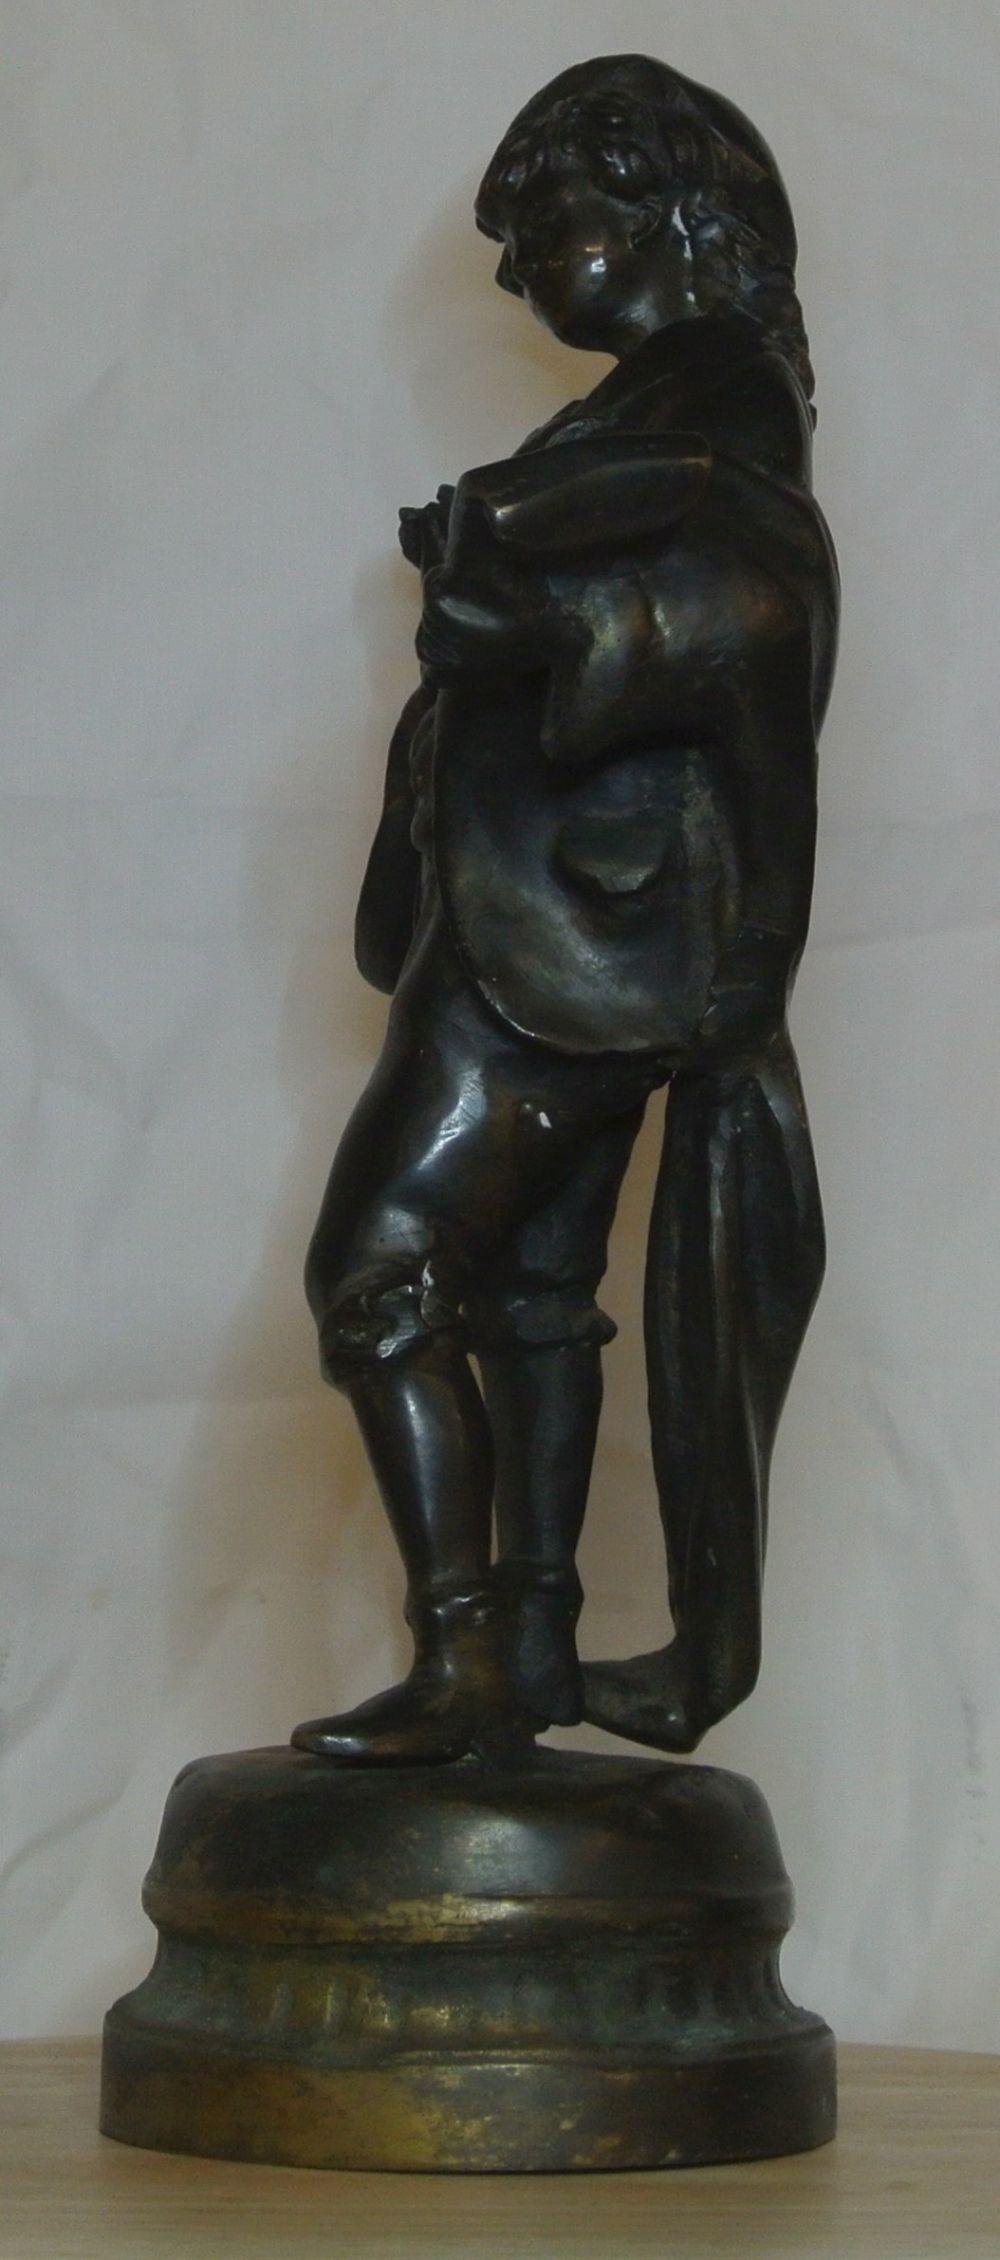 Lot 14: An antique bronze figure, modelled as an artist with palette.